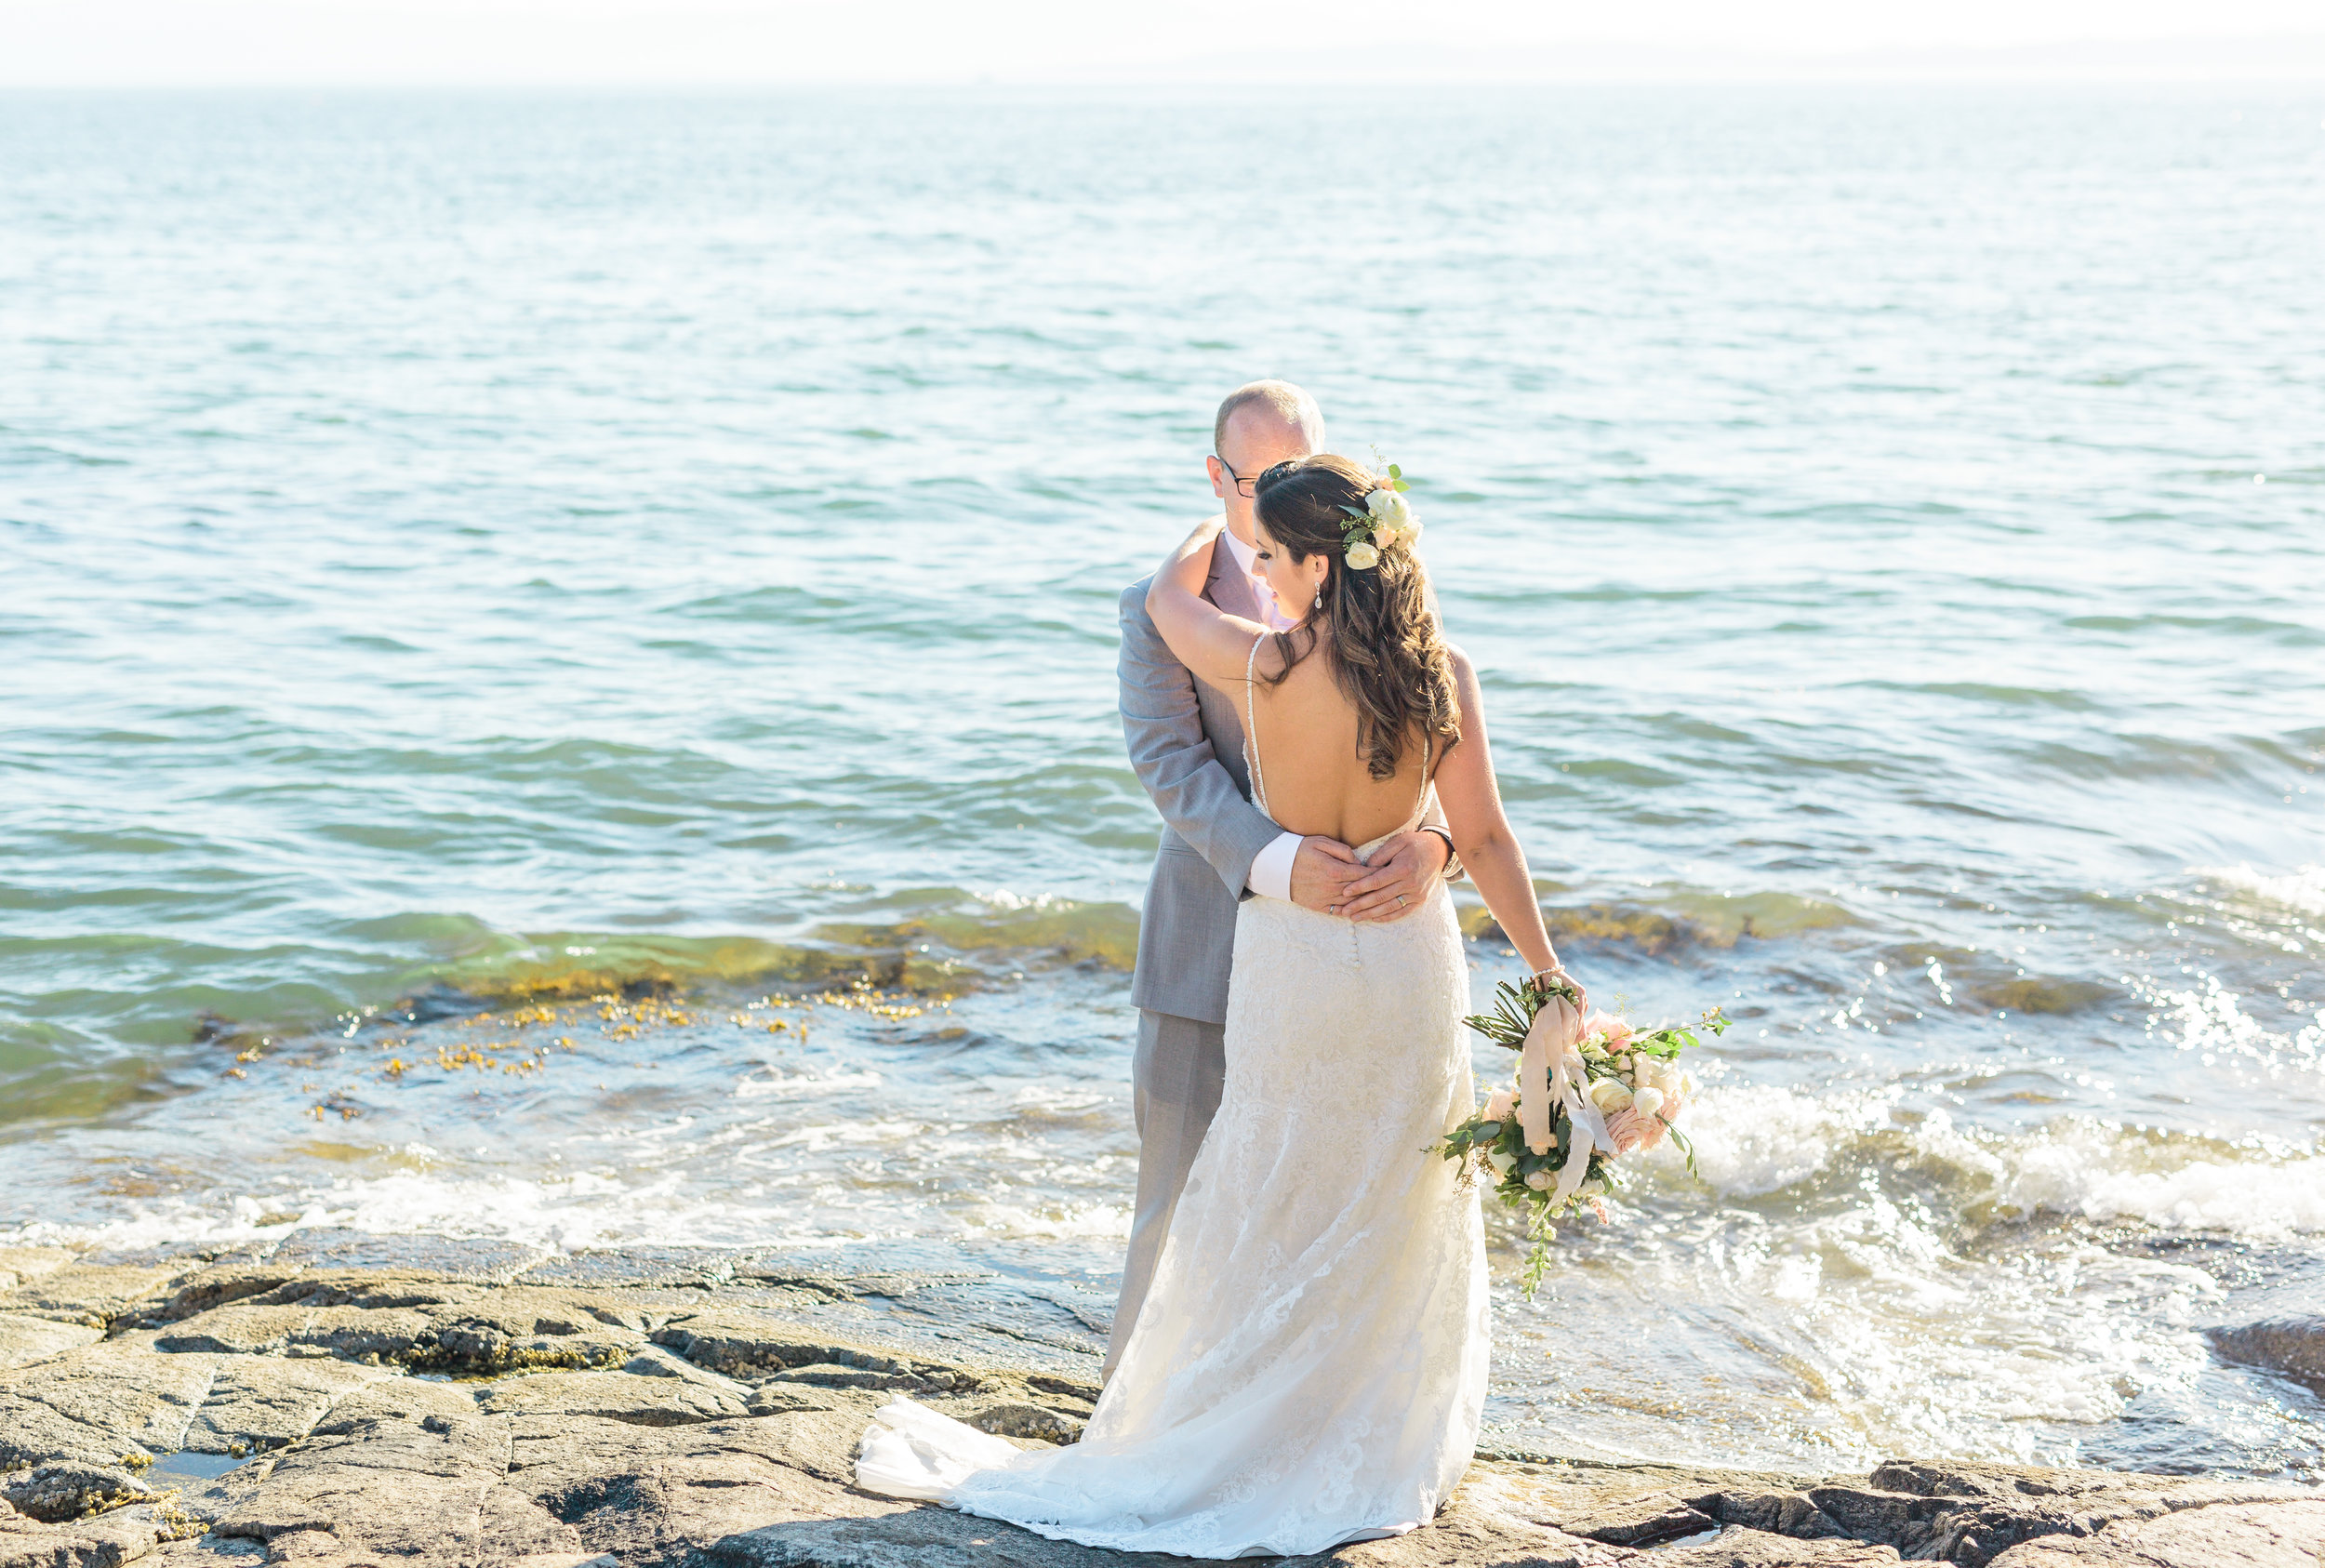 Rockwater Secret Cove Resort Wedding, Jennifer Picard Photography, Sunshine Coast BC Wedding Photographer